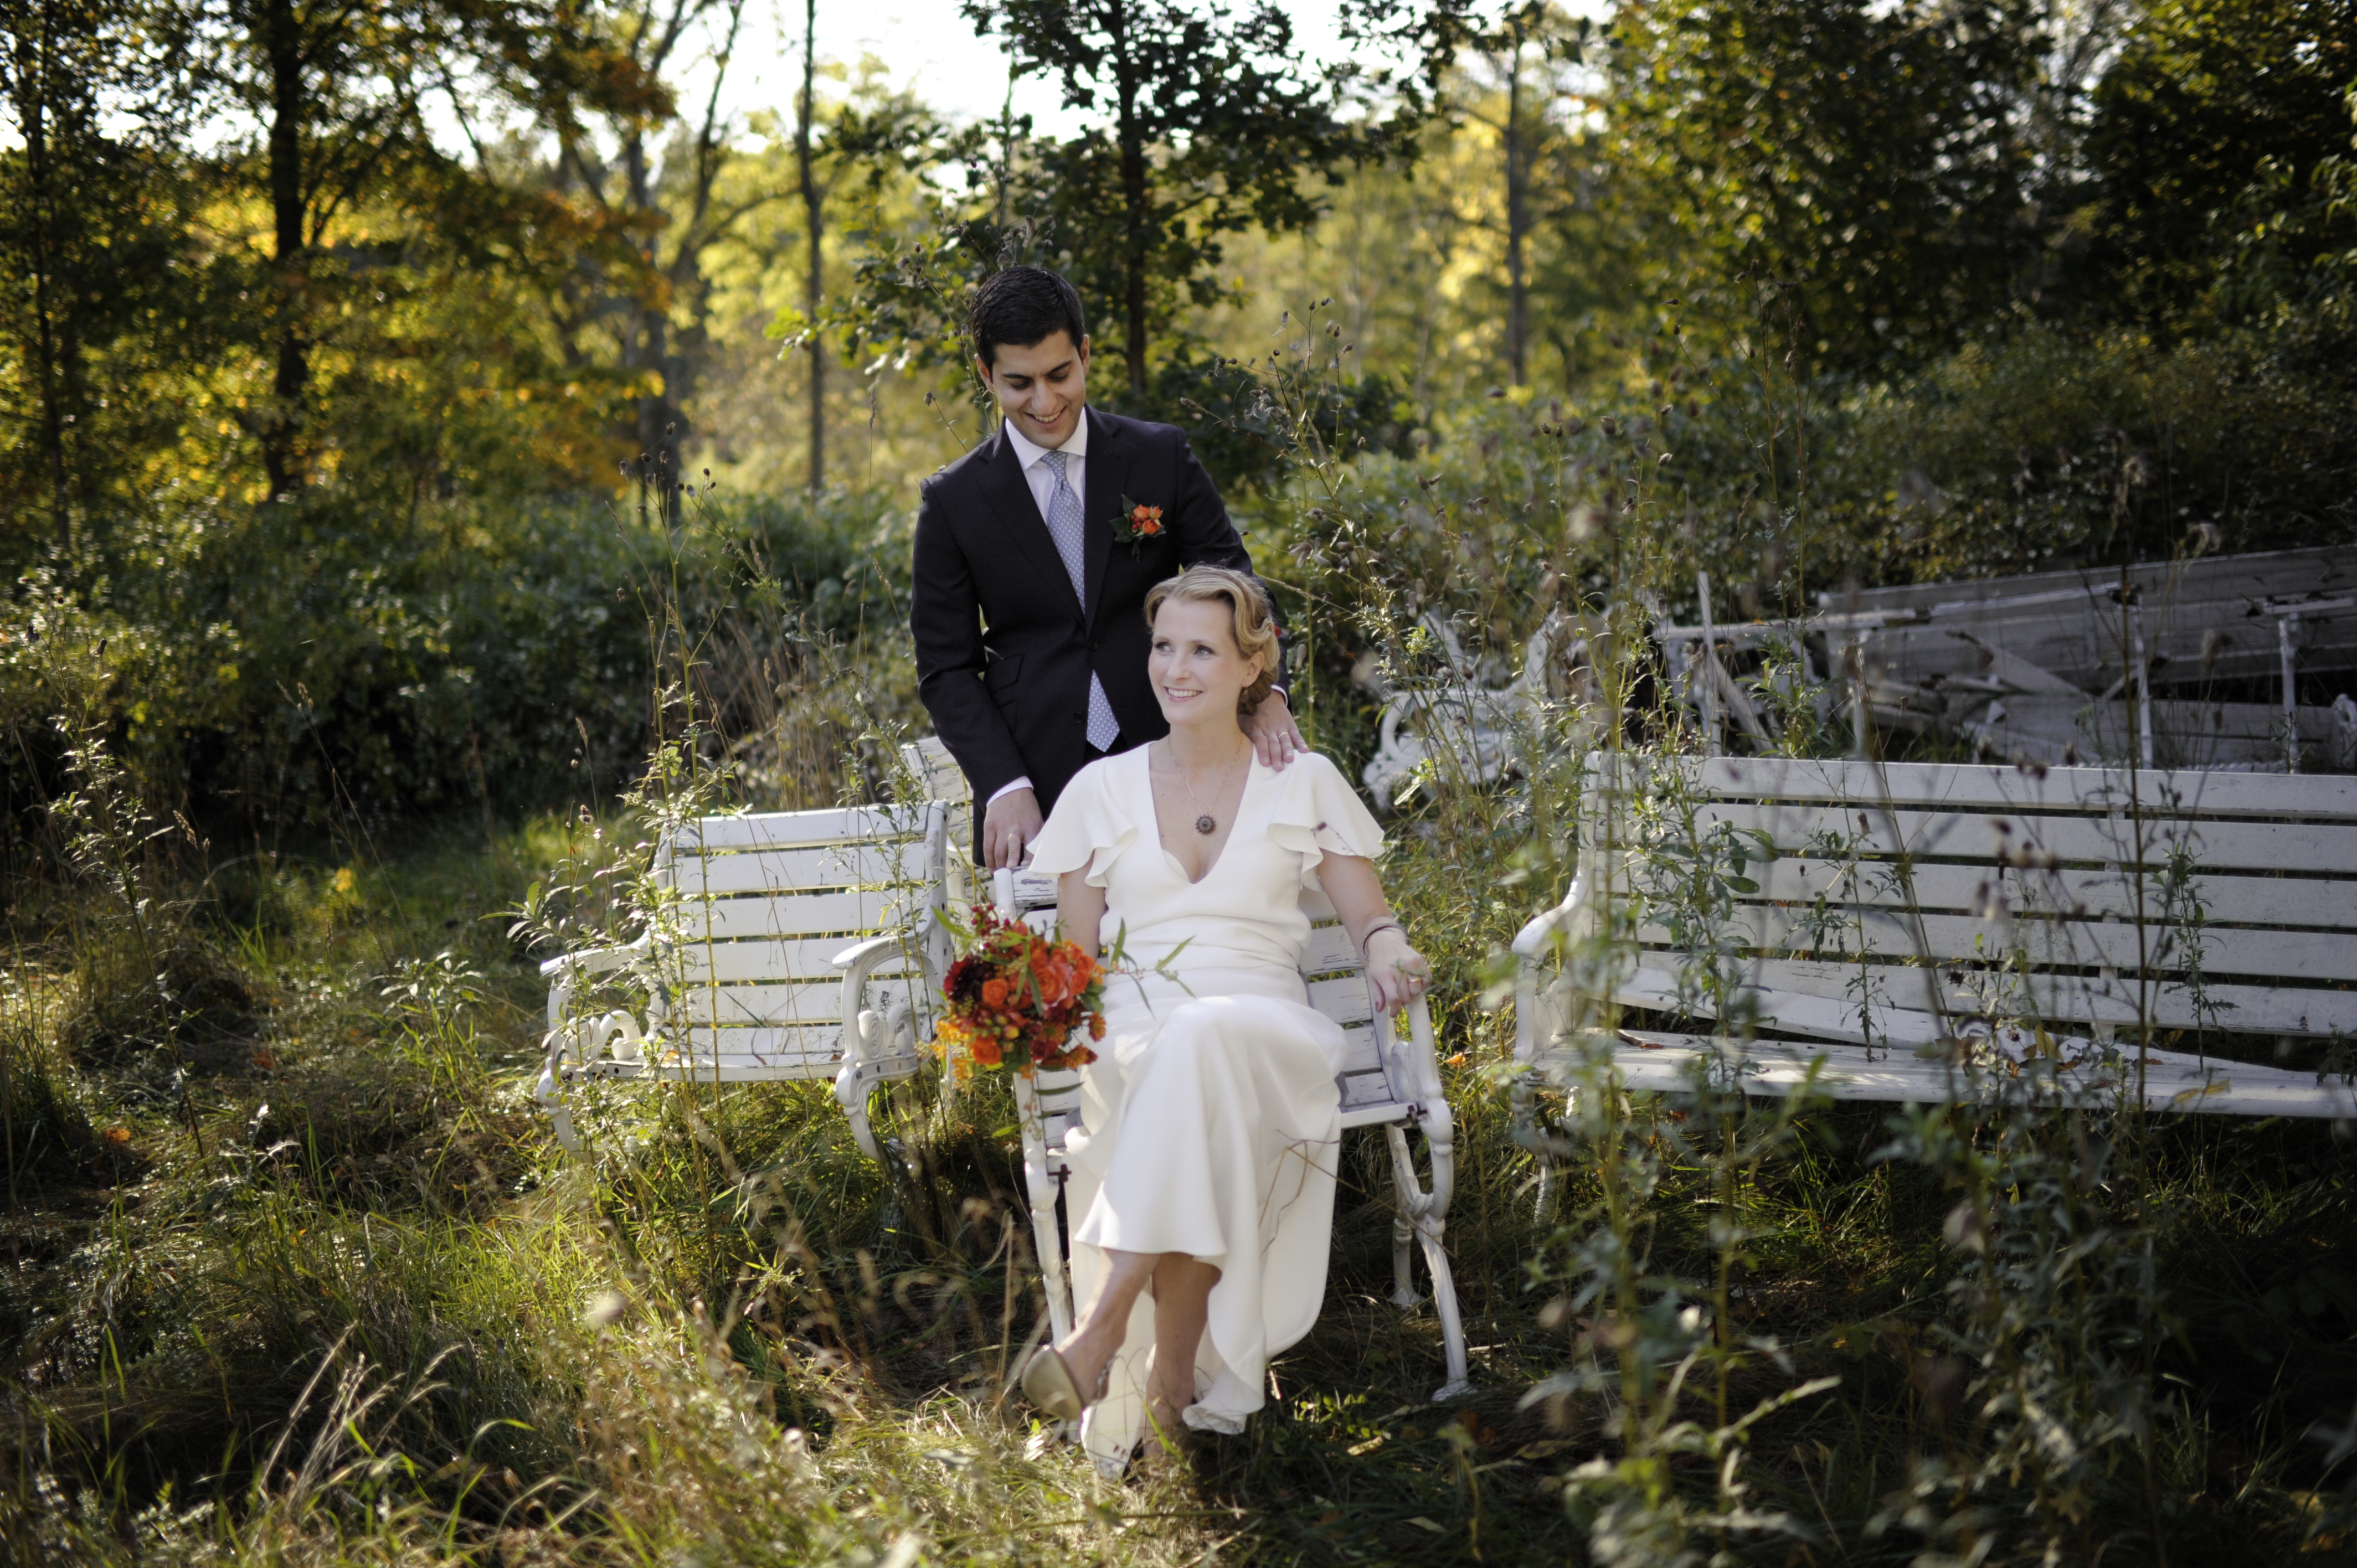 Bröllop_galleri.jpg